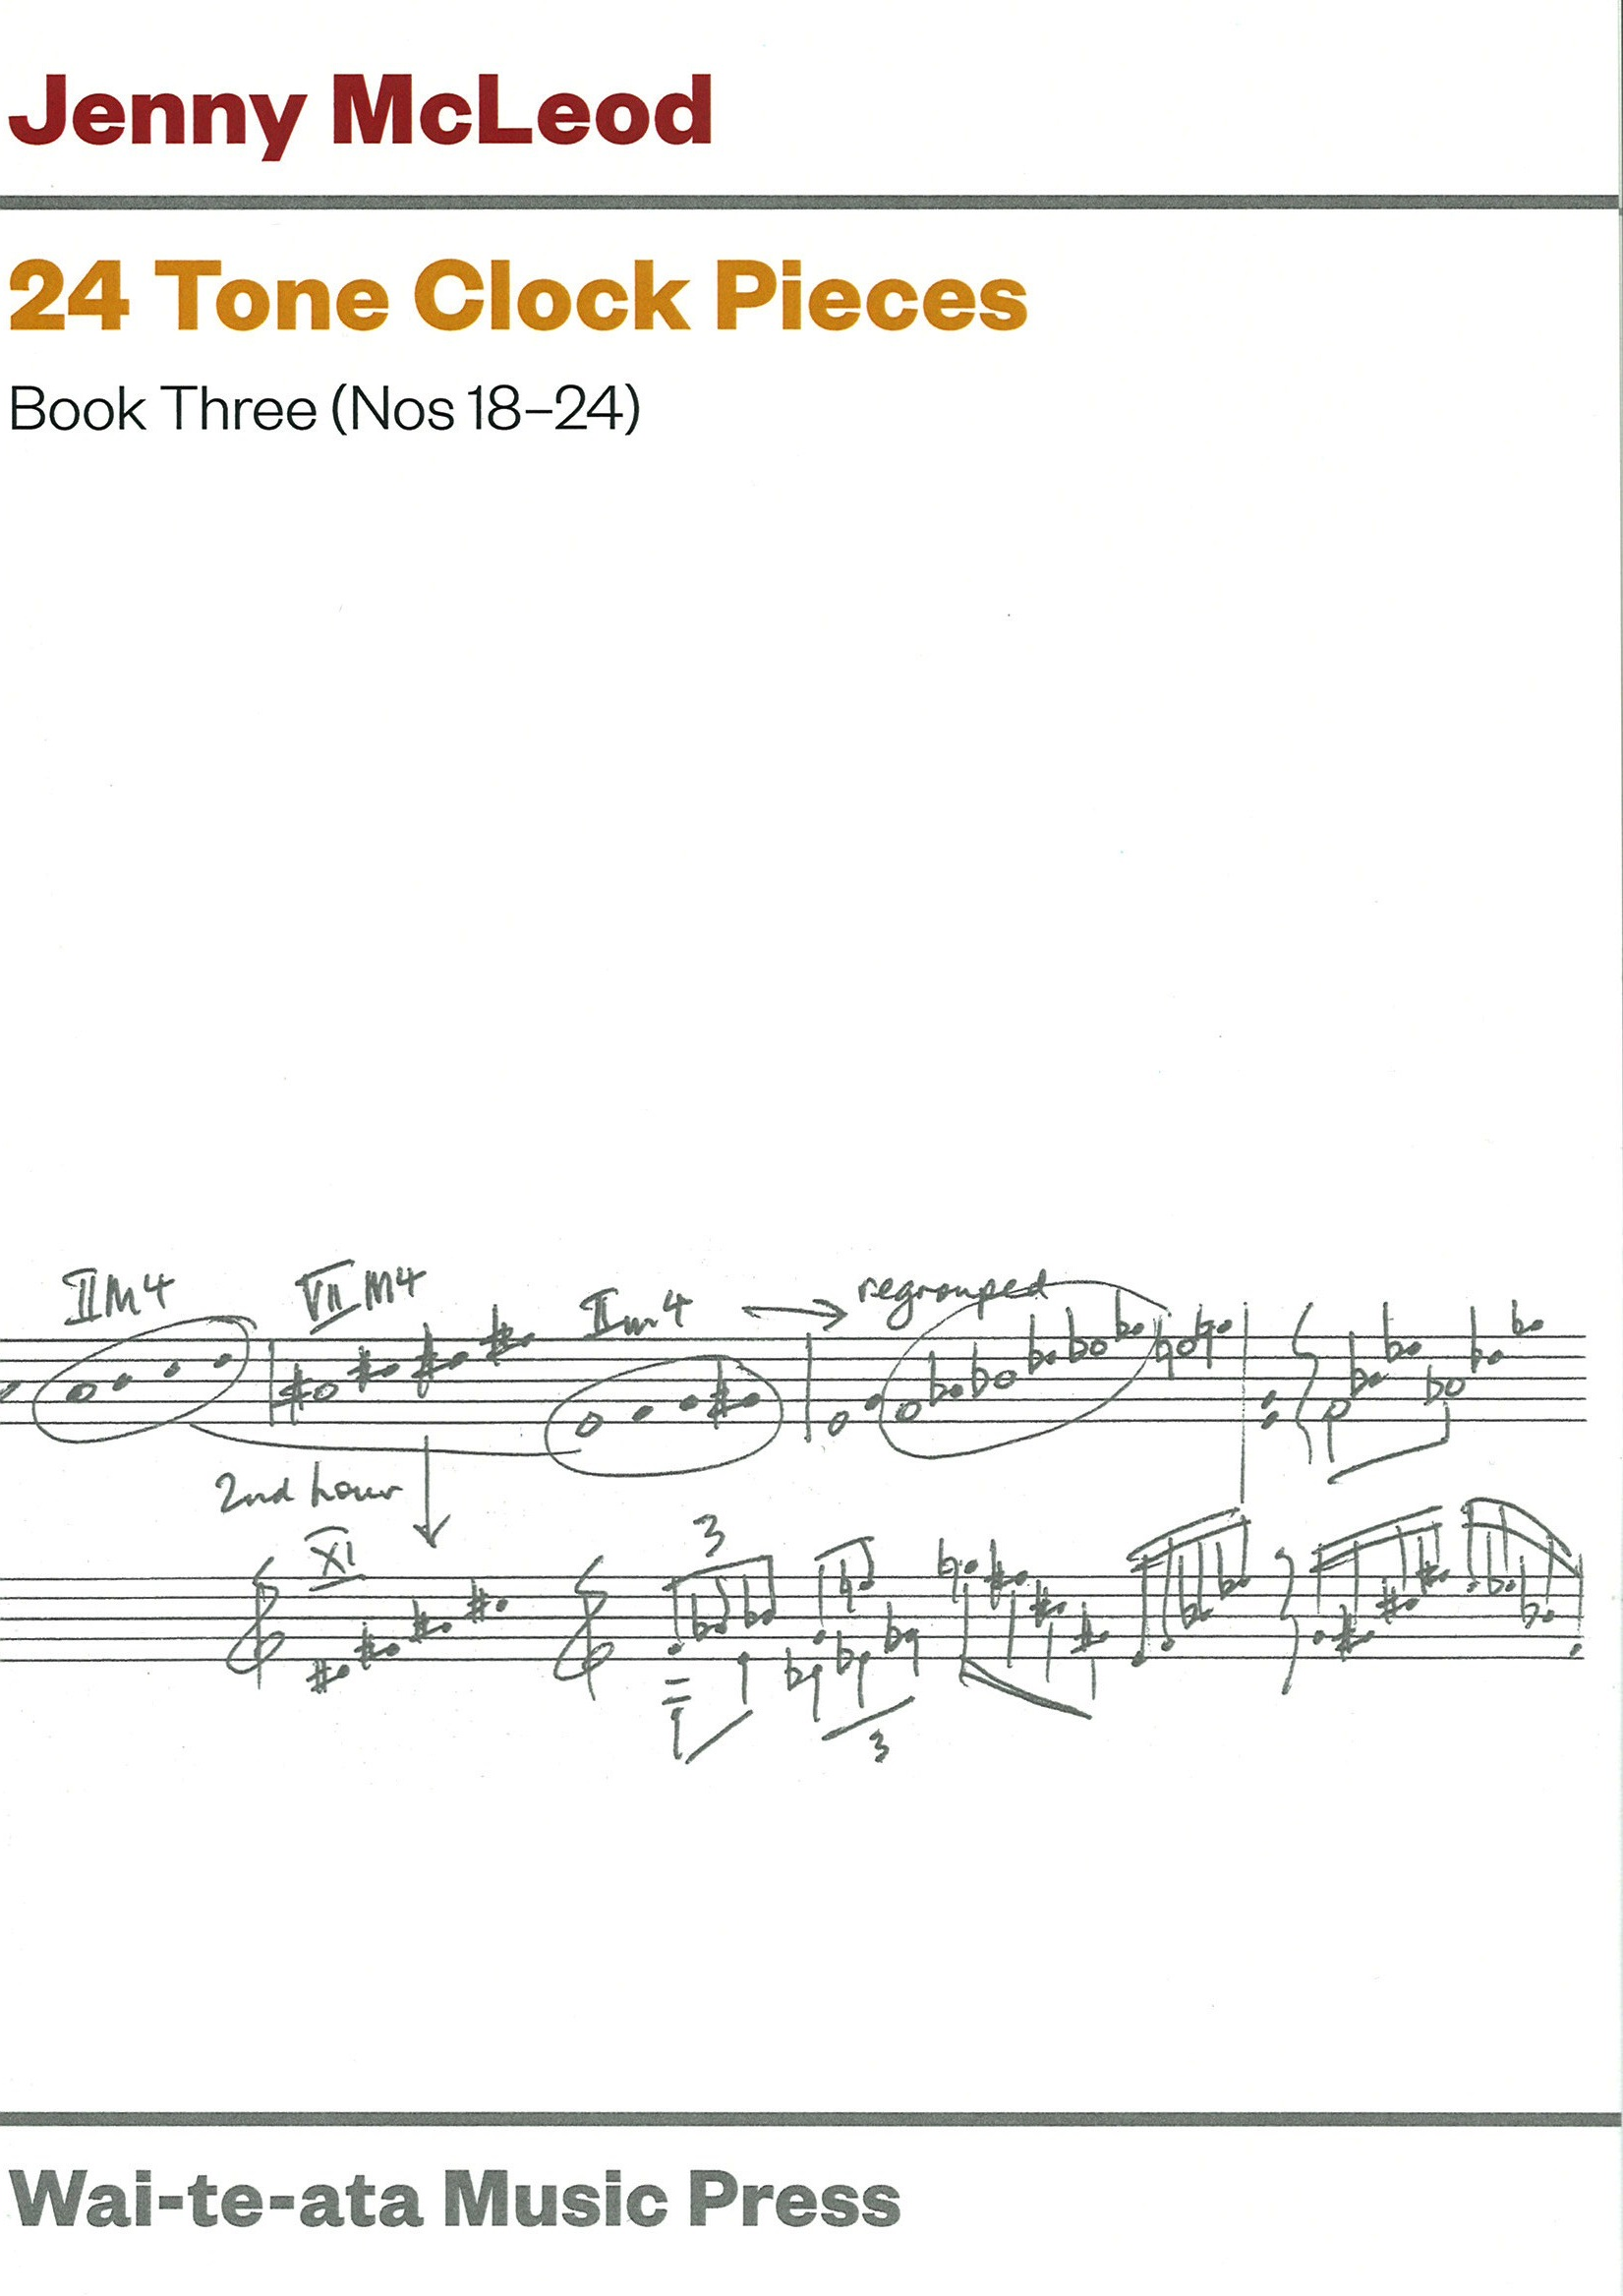 Jenny McLeod: 24 Tone Clock Pieces - Book Three (Nos 18-24) - hardcopy SCORE